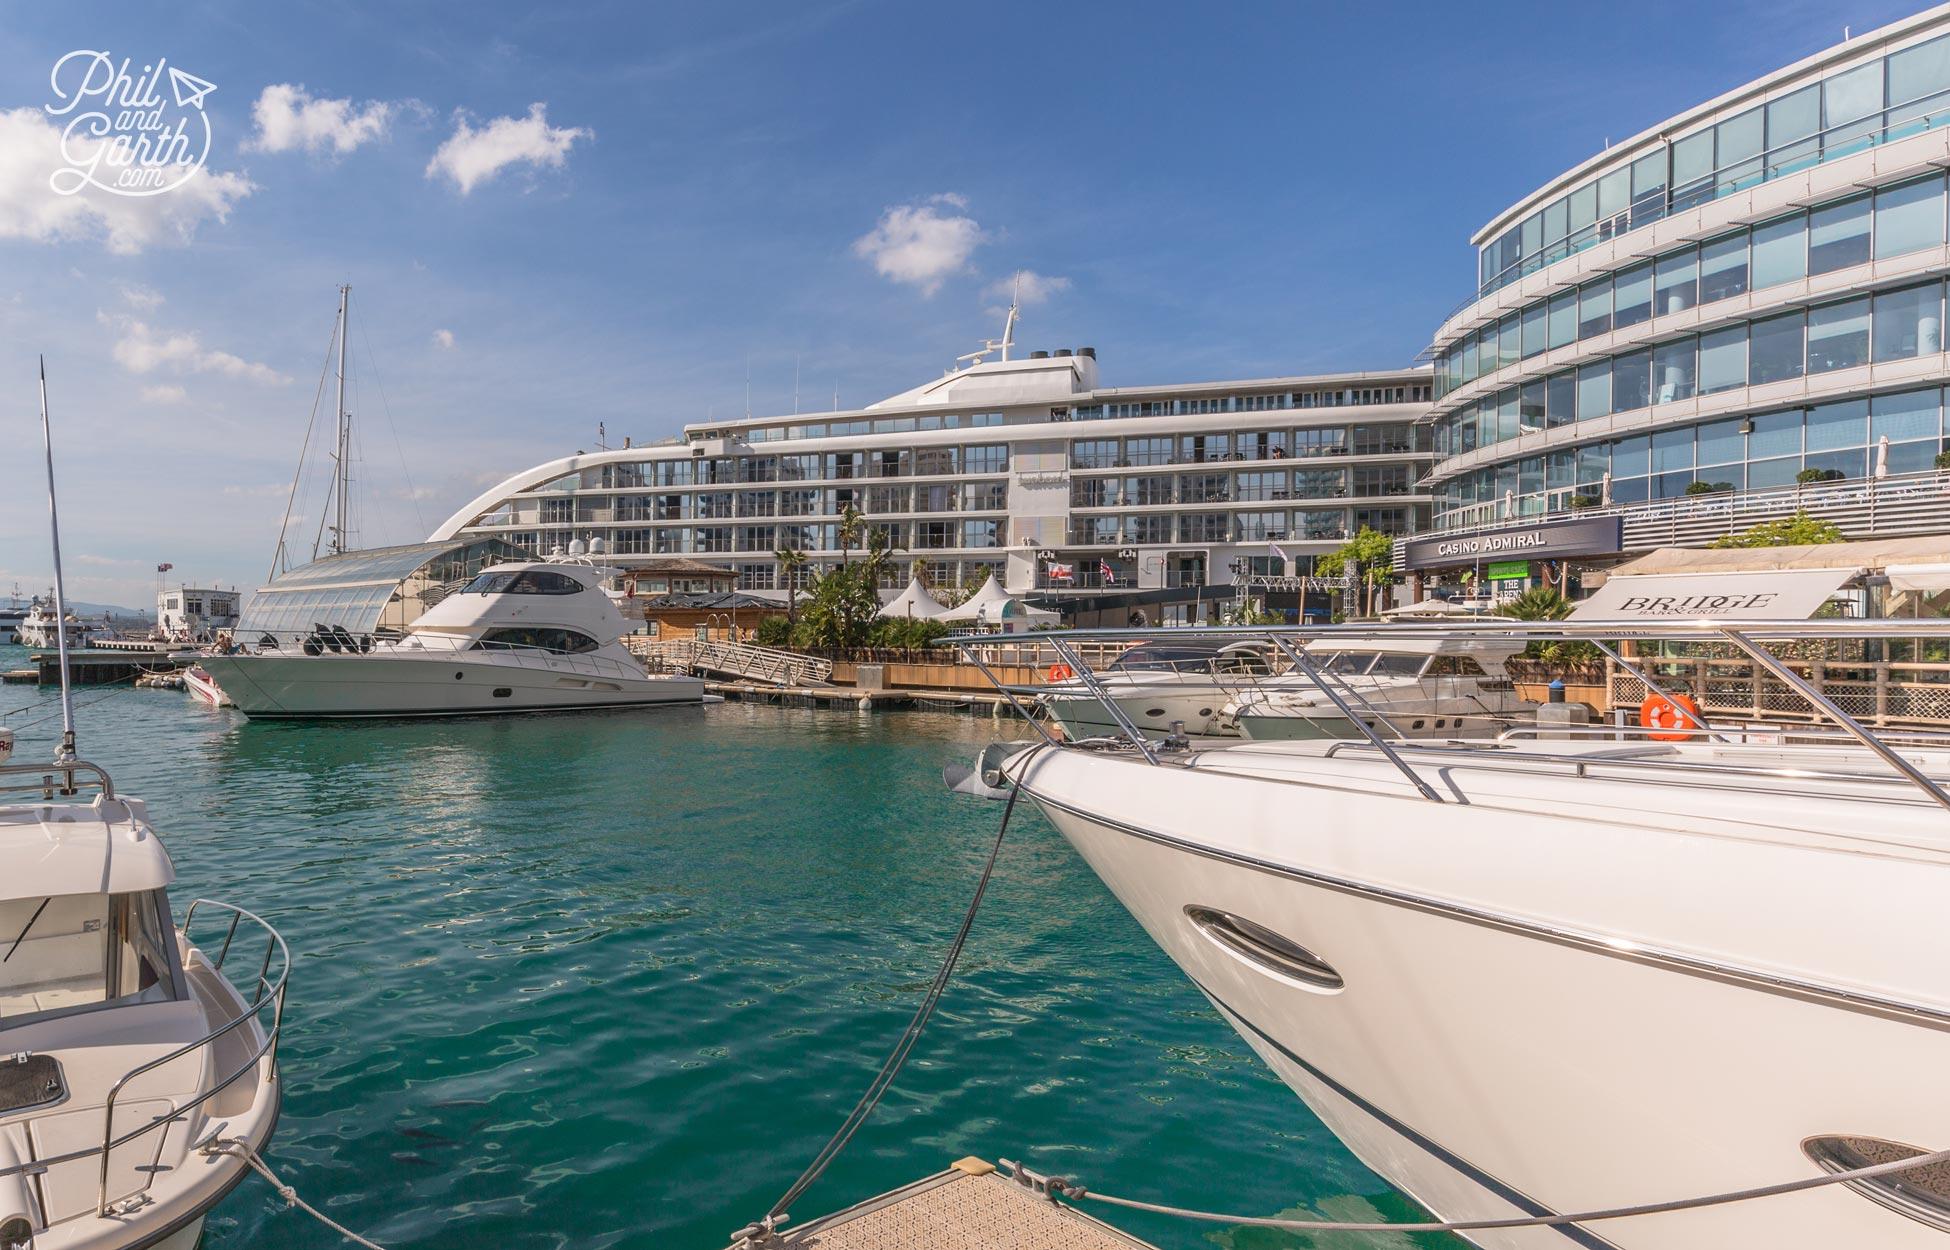 Gib's glamorous area at the Marina